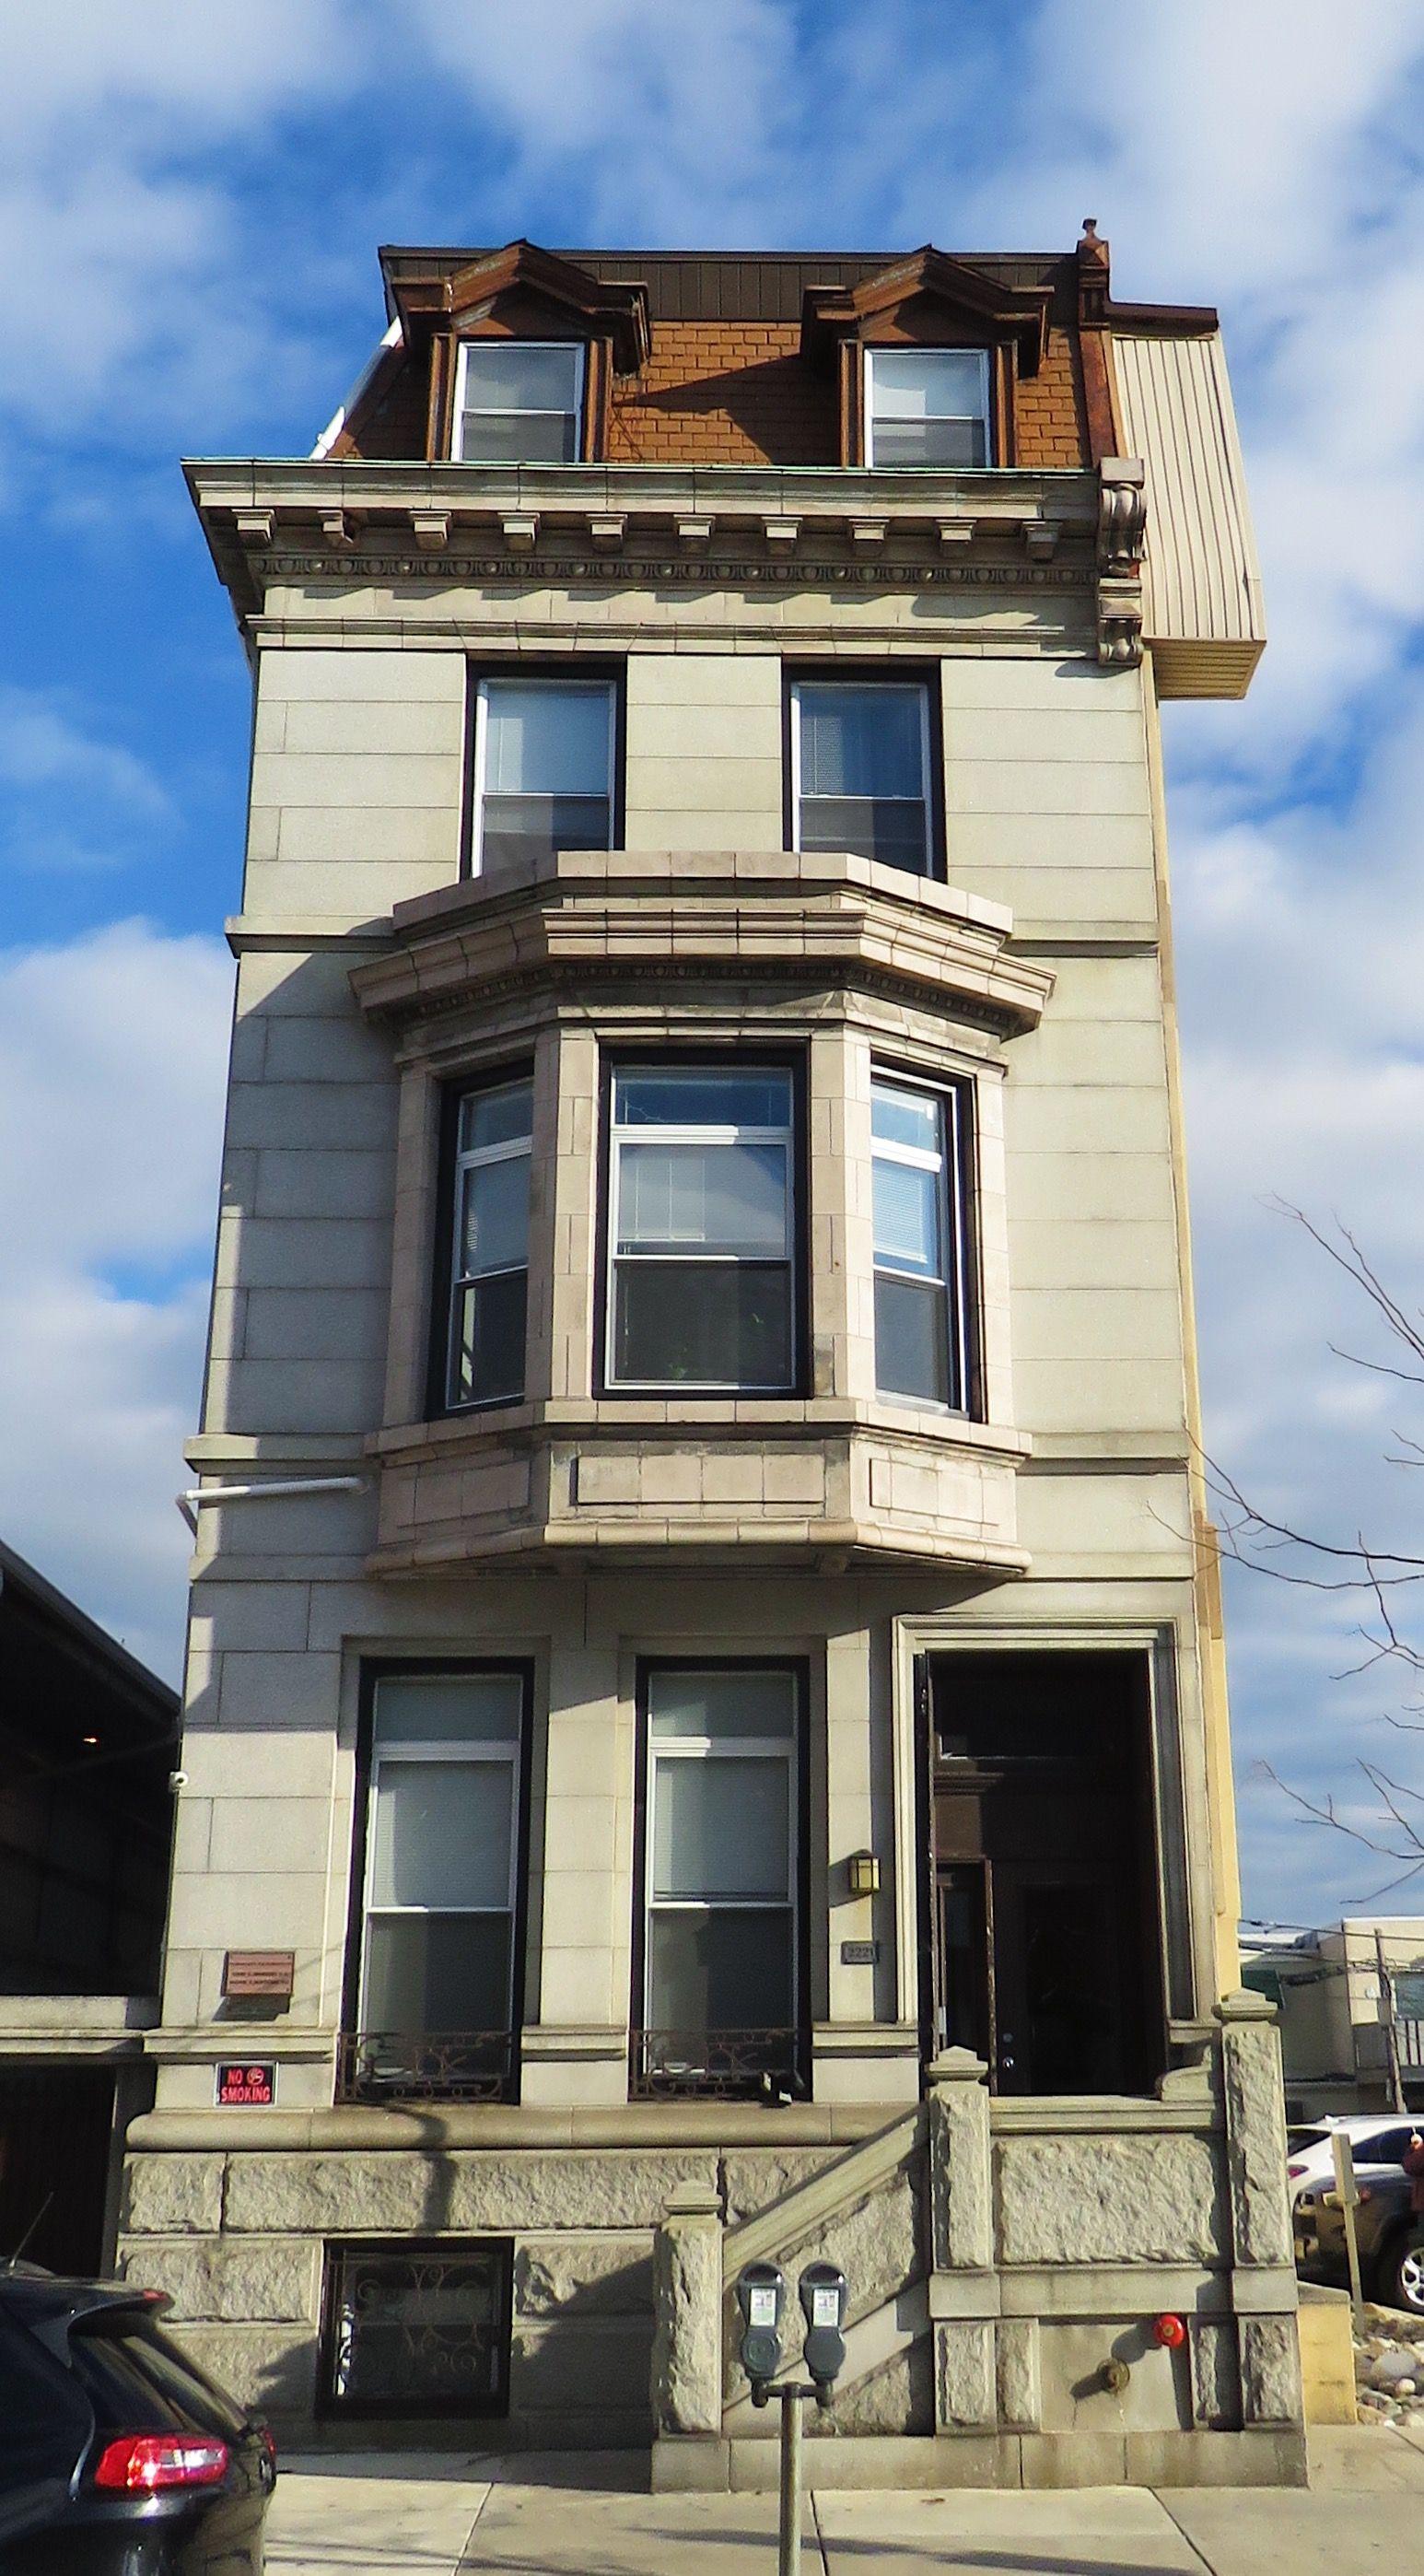 2221 S Broad St Phila Pa 19148 1 Bedroom Apt For Rent Now Recently Rehabbed Spacious Open Floor Plan Philadelphia Real Estate Open Floor Plan Apt For Rent